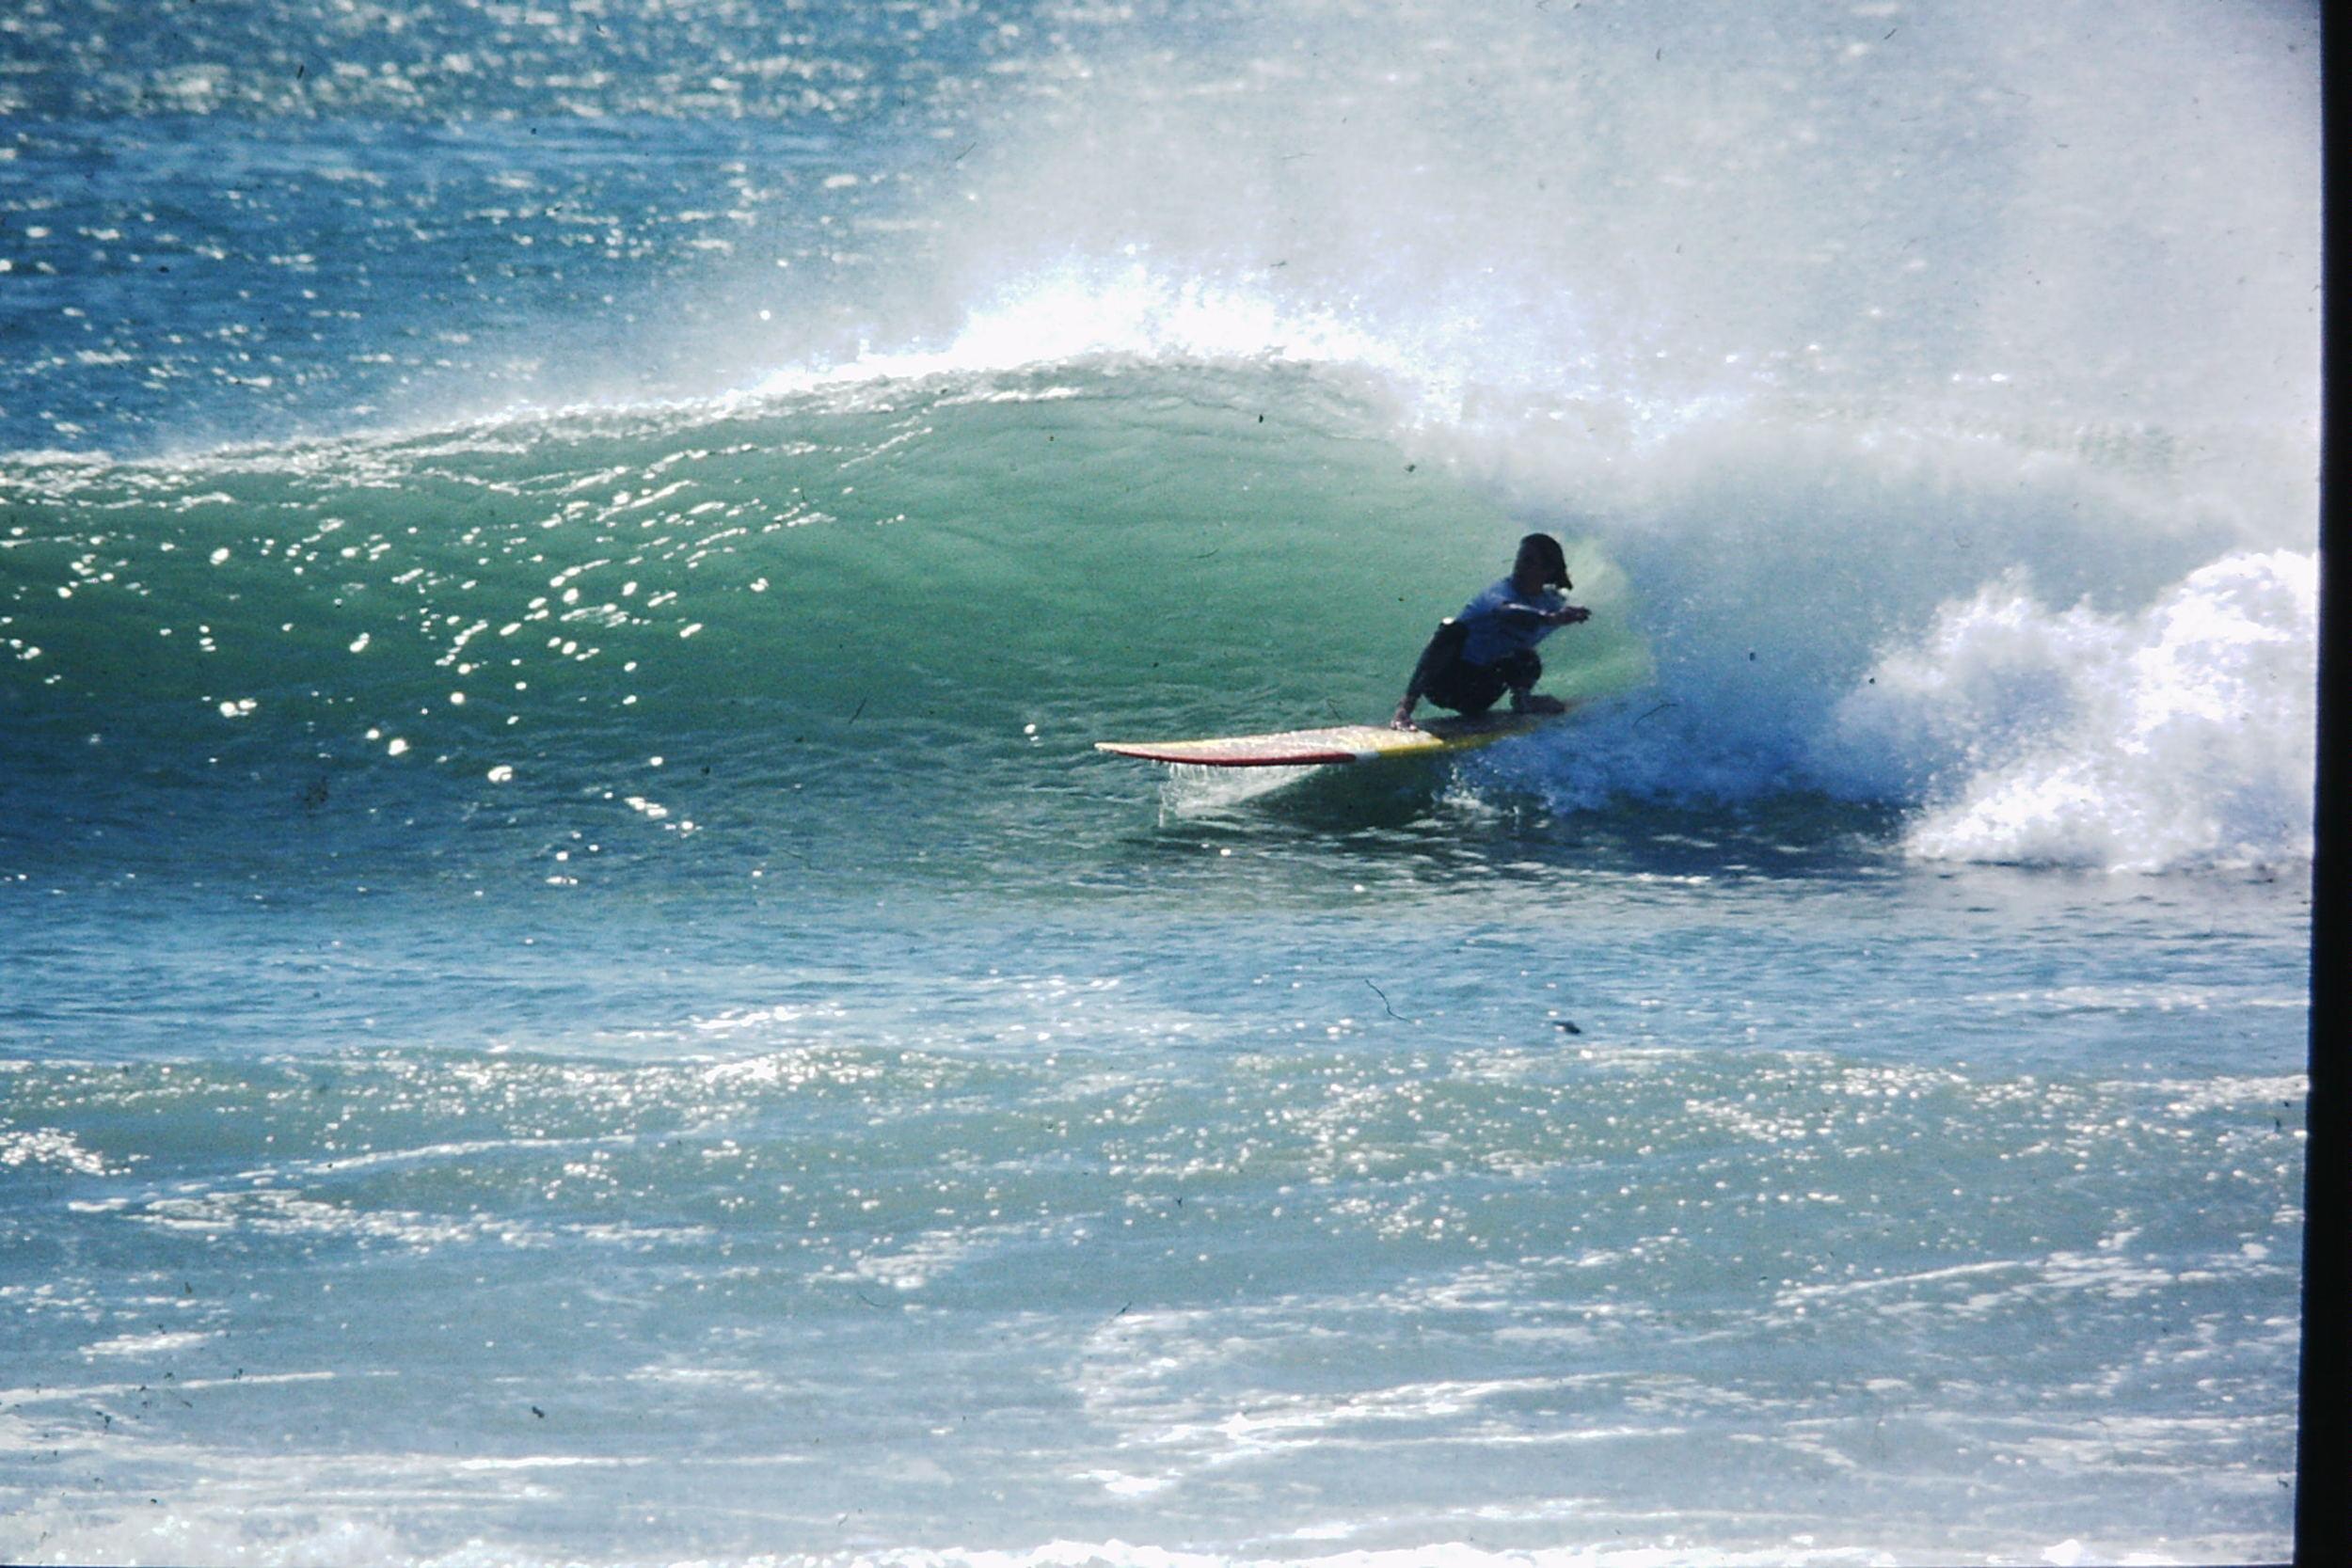 bruce_jones_surfboards_14.JPG